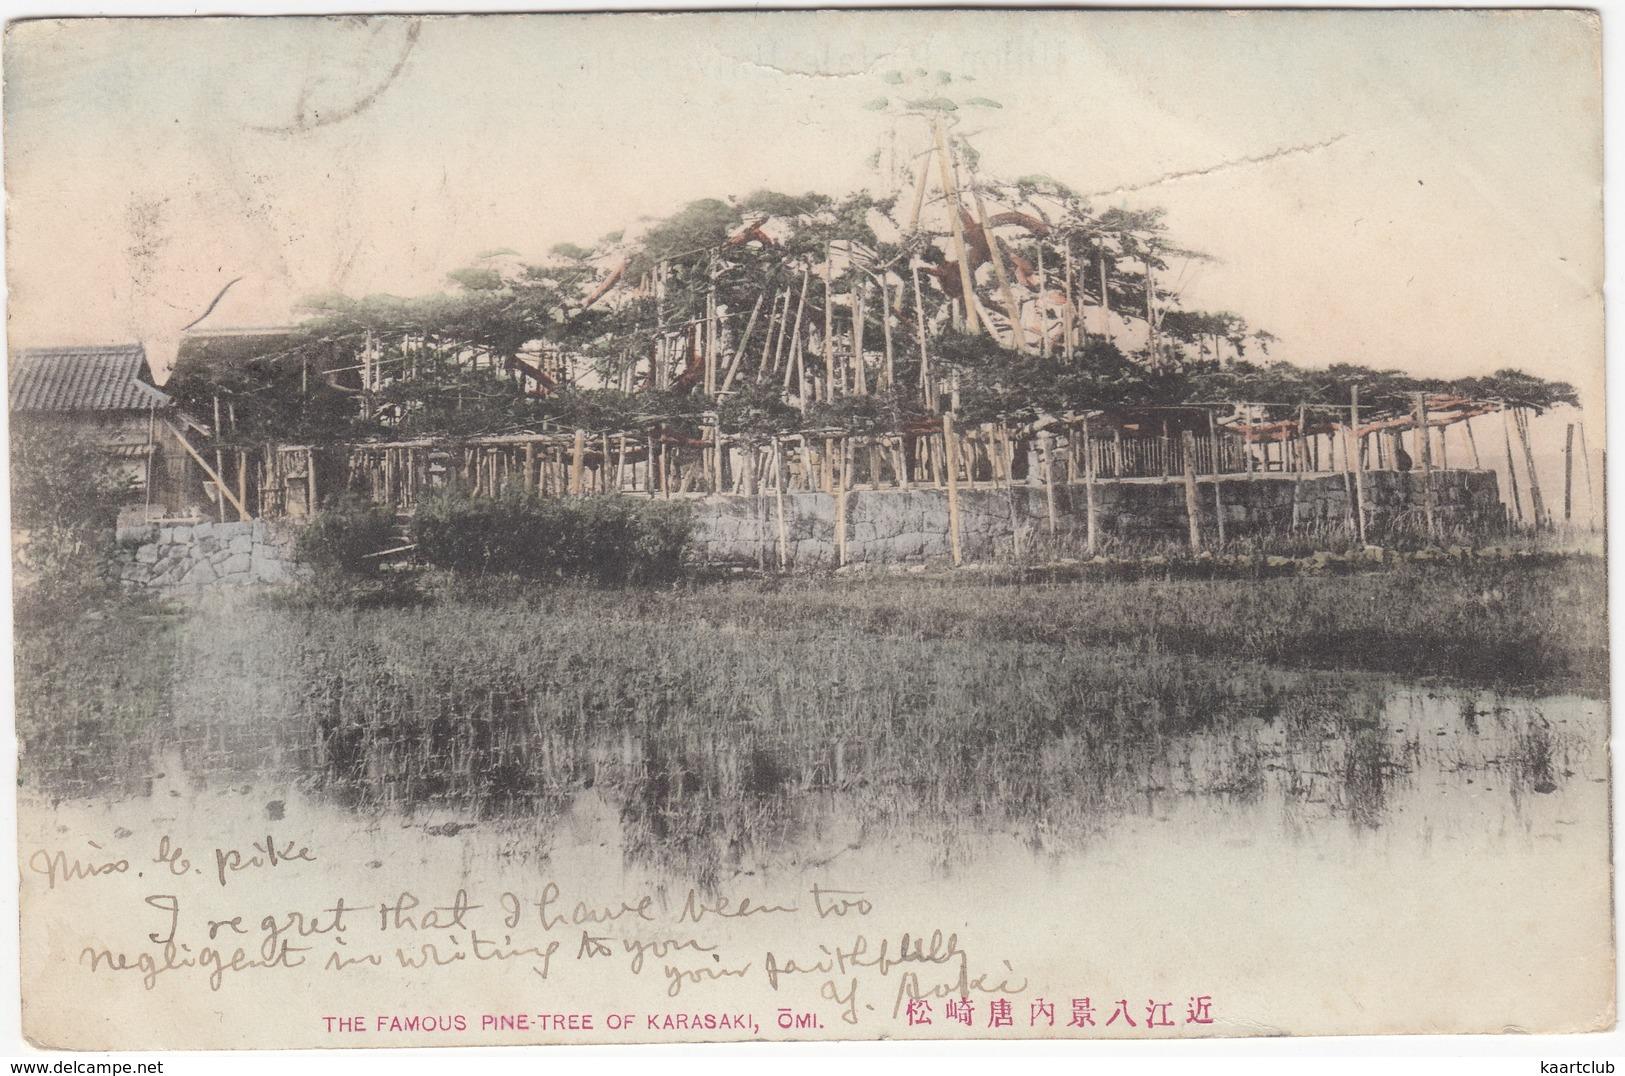 The Famous Pine Tree Of Karasaki, Omi - (Japan) - Undivided Postcard, 1906 - Tokyo To London - Andere